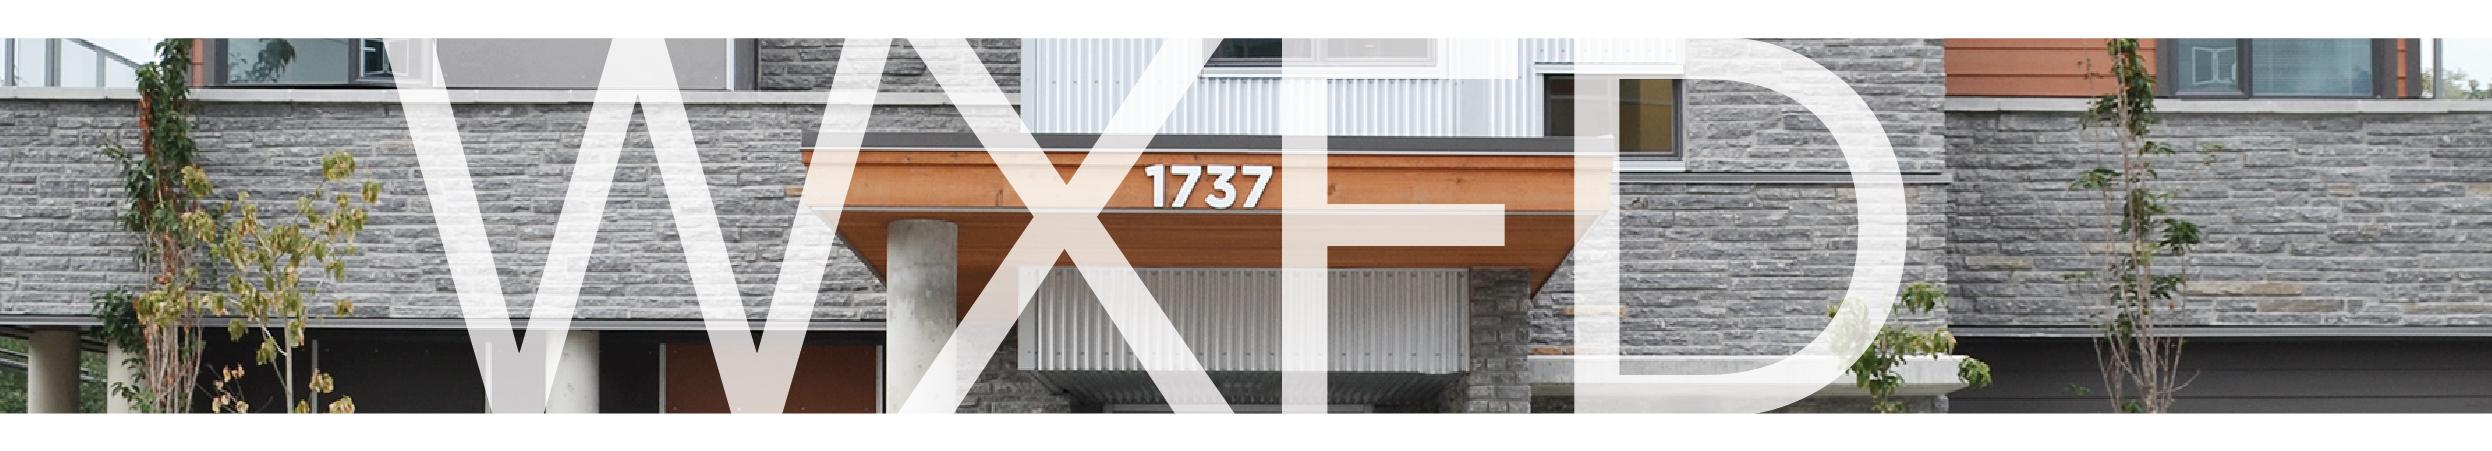 Project Tiles-06.jpg